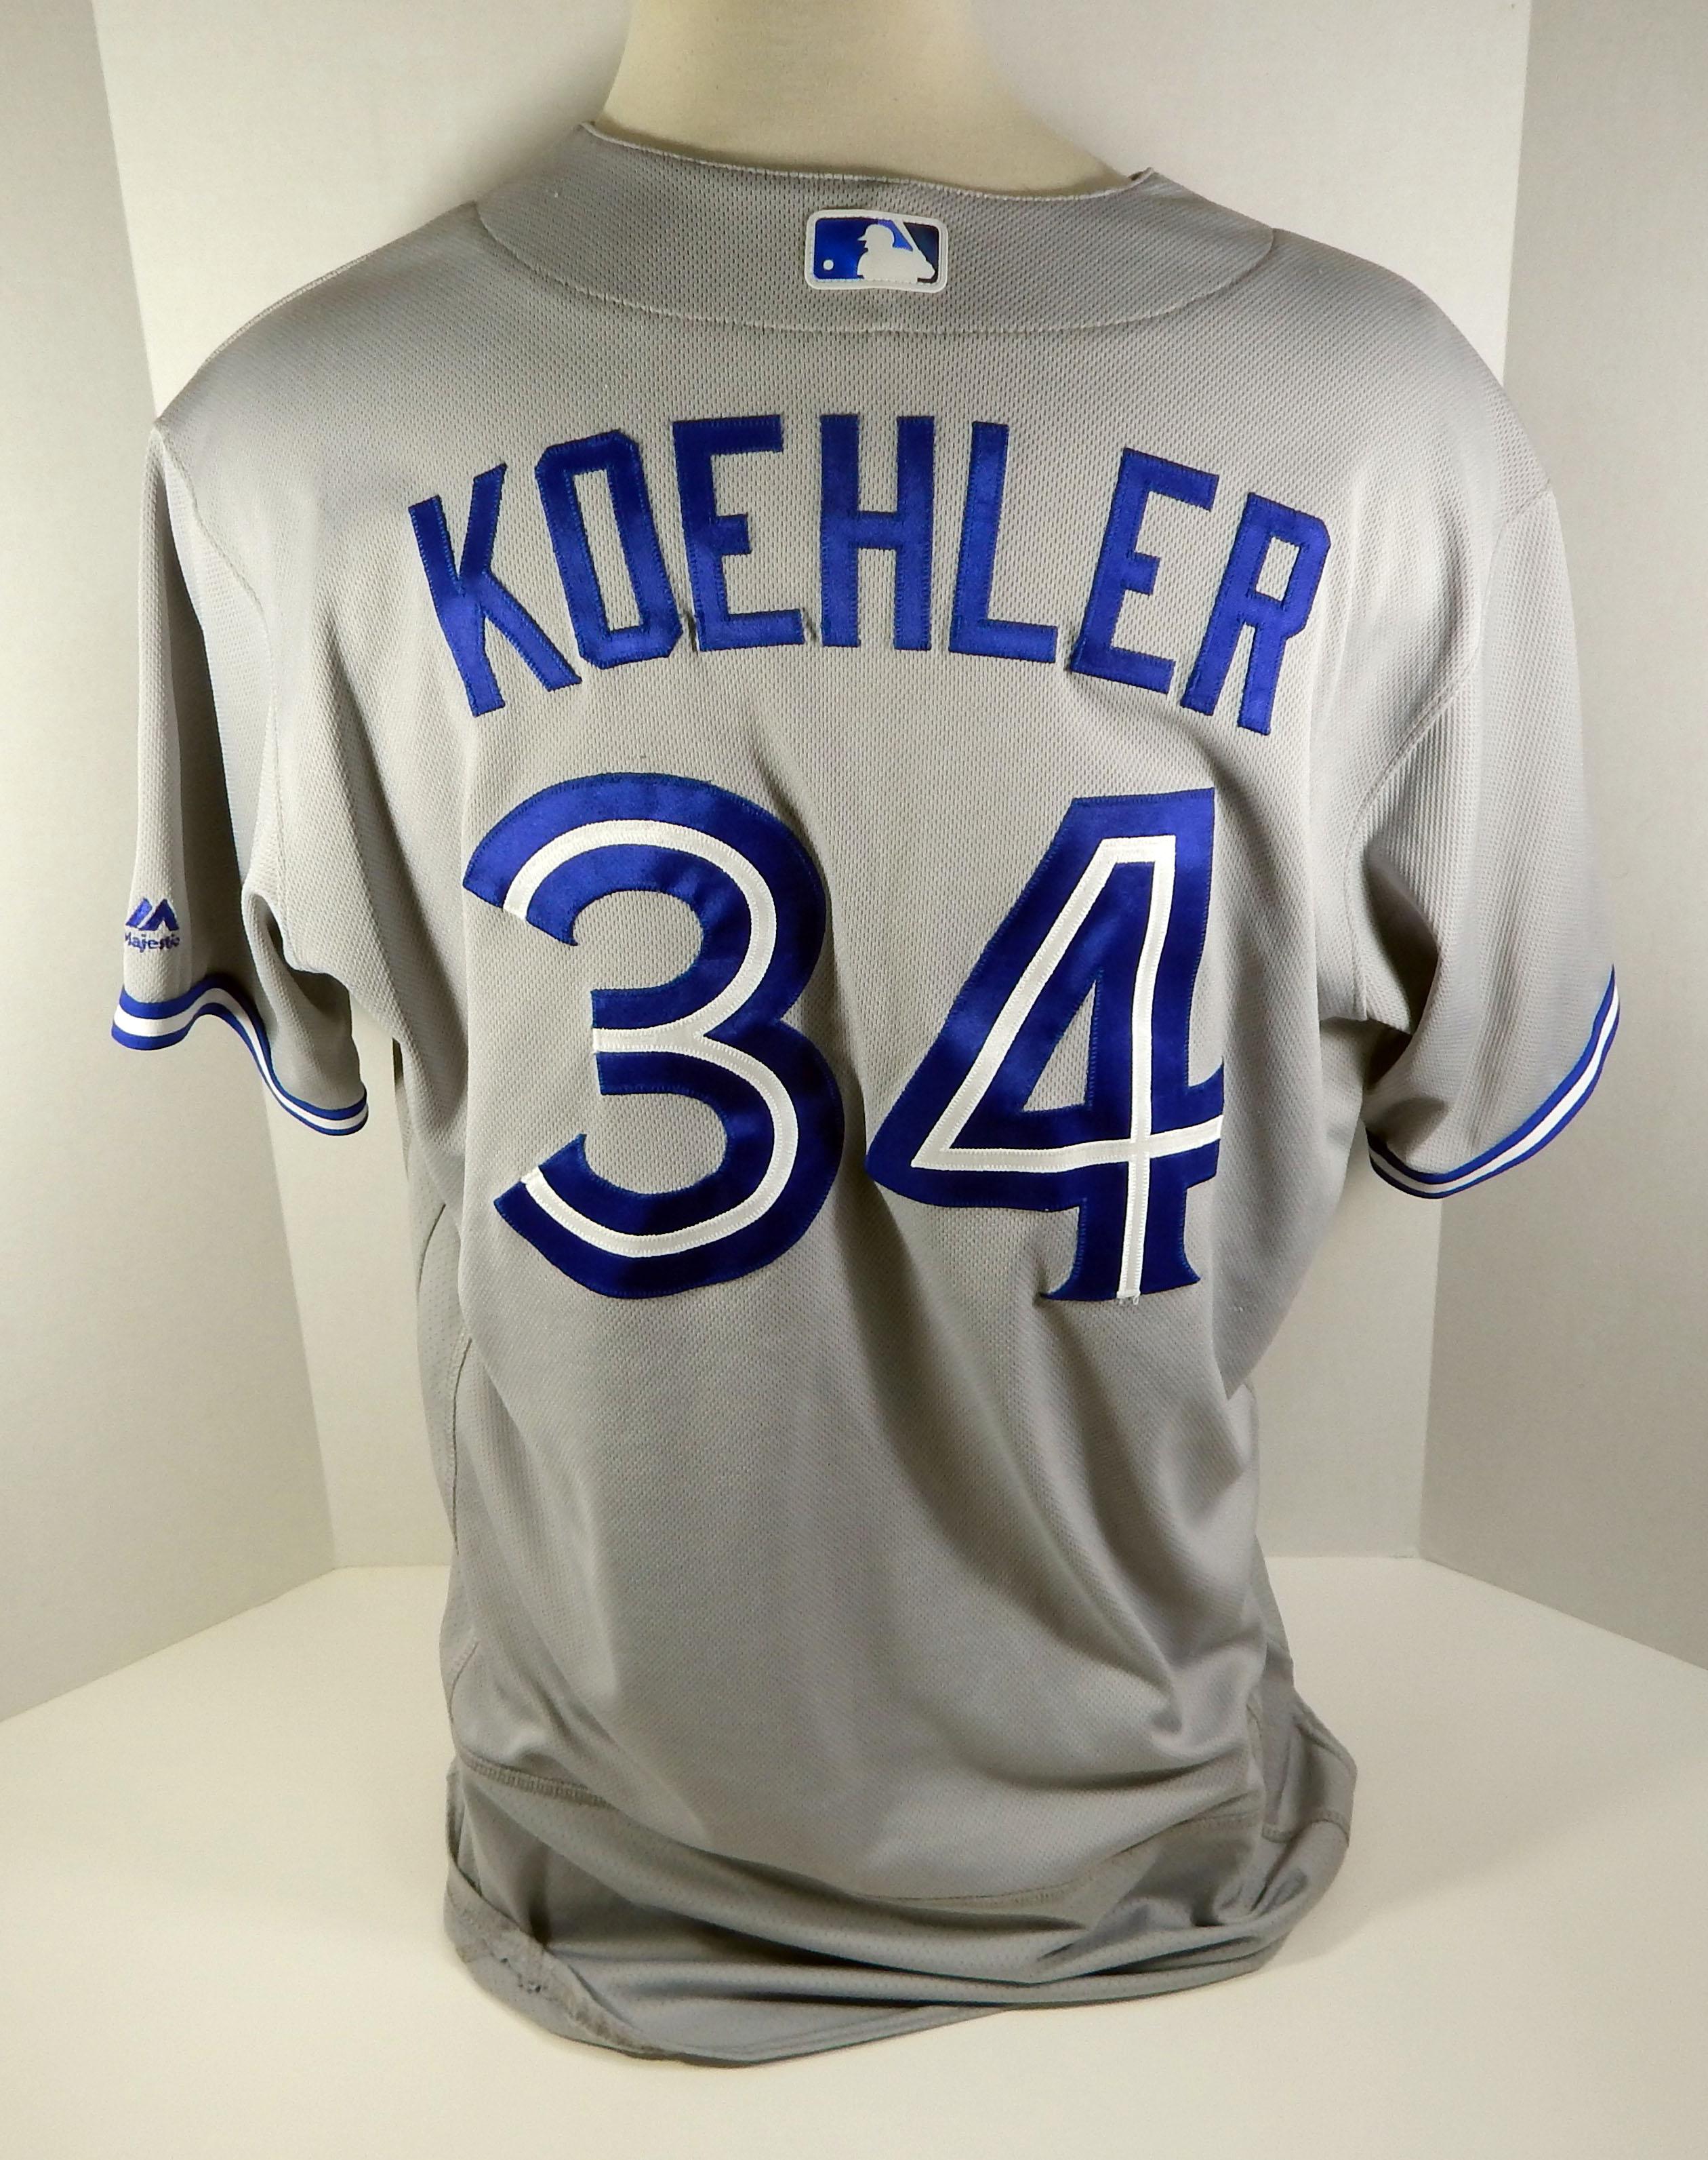 reputable site 7e904 4baa9 2017 Toronto Blue Jays Tom Koehler #34 Game Used Grey Jersey ...